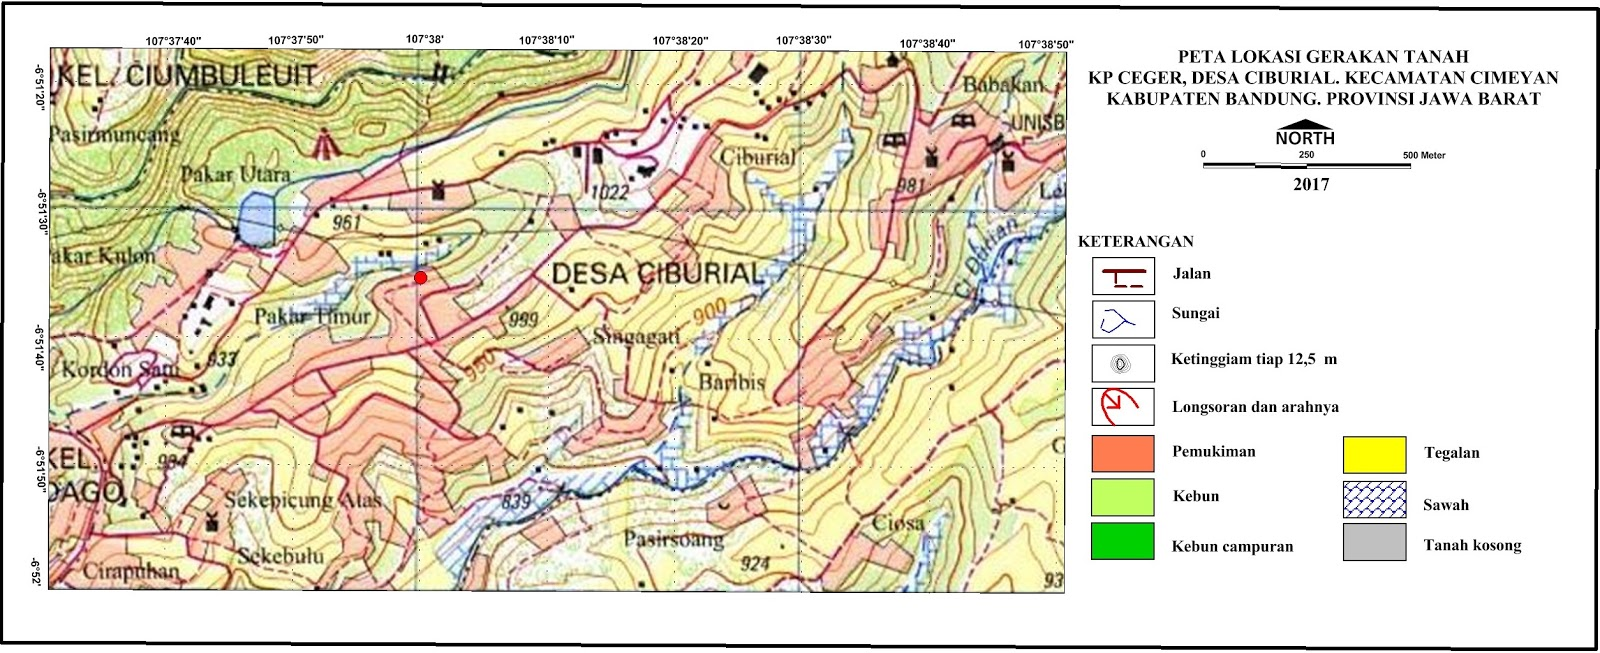 Peta lokasi gerakan Kp. Ceger RW 12, Desa Ciburial, Kecamatan Cimenyan, Kabupaten Bandung, Jawa Barat